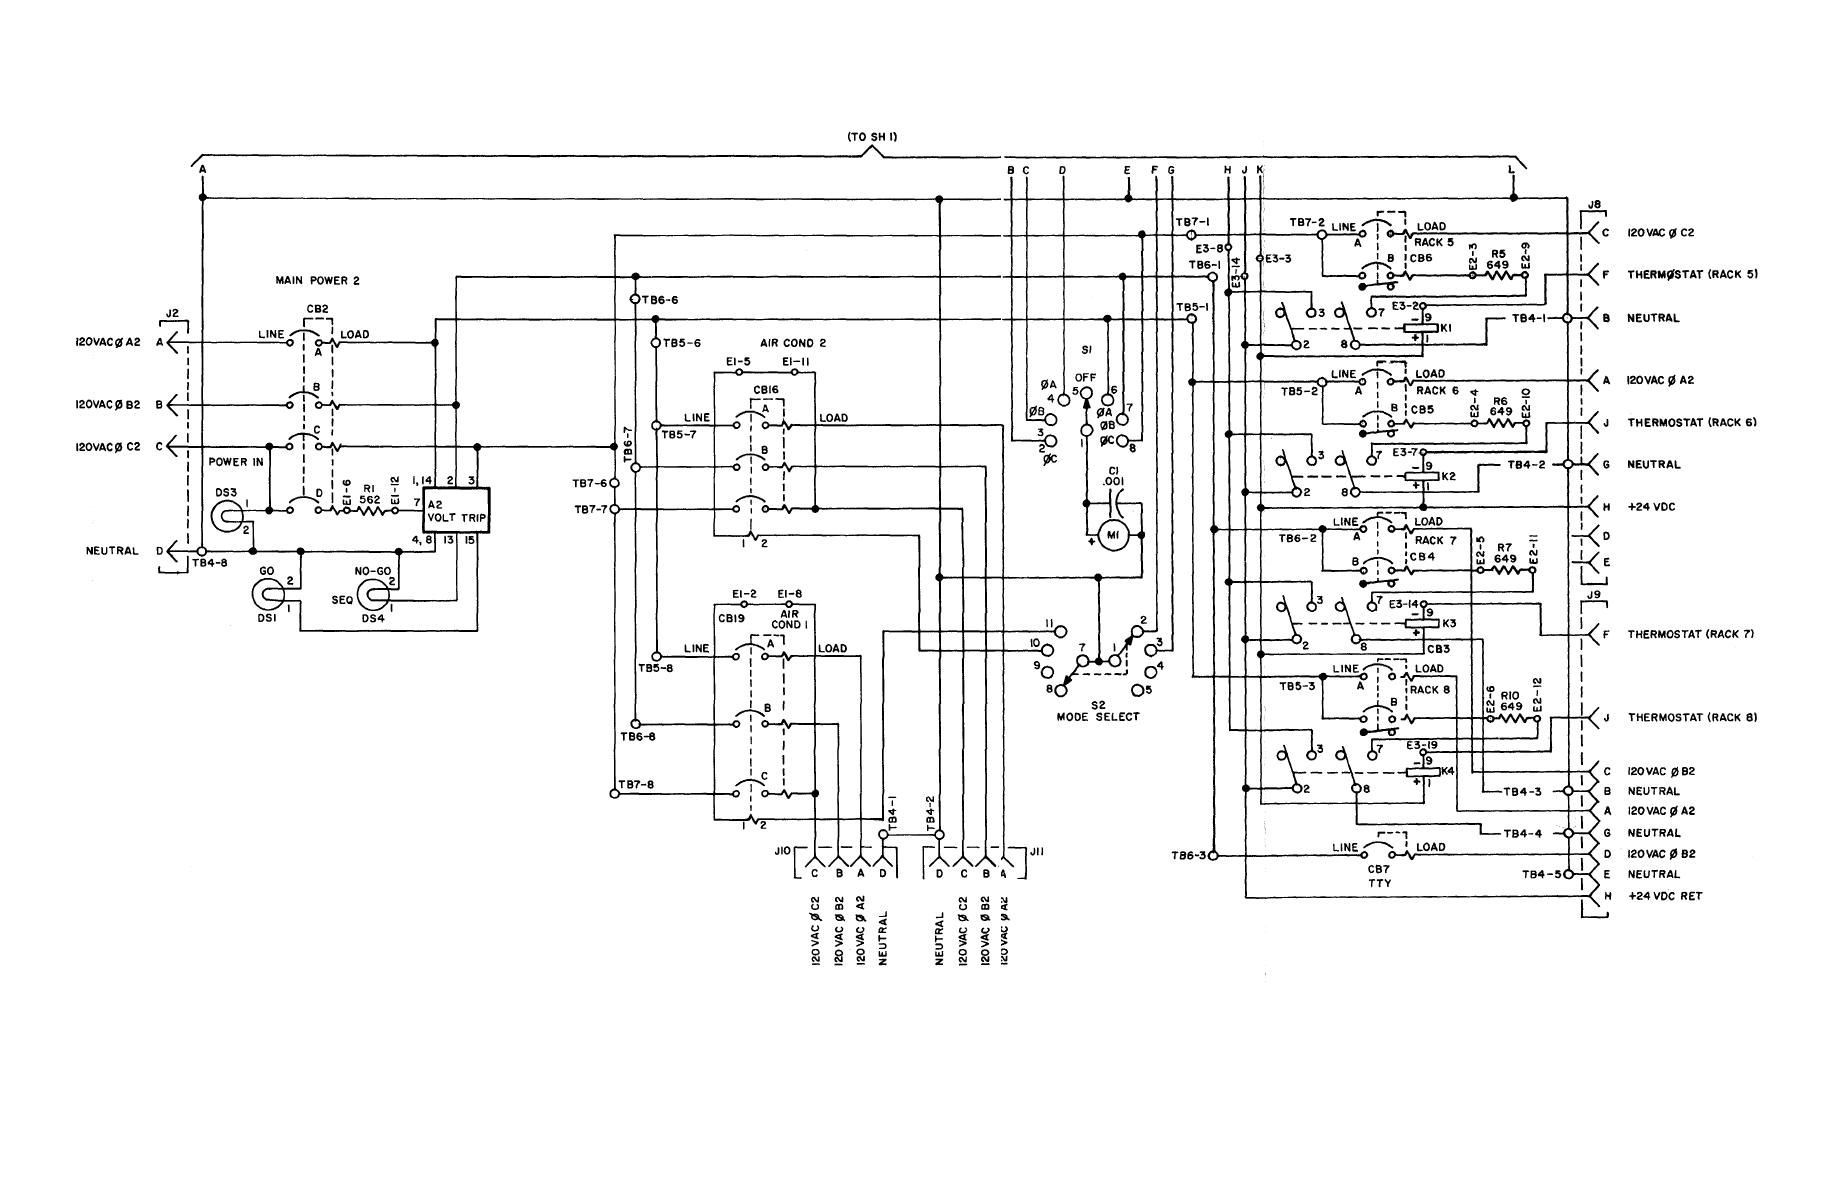 [QNCB_7524]  OT_6864] Distribution Panel Wiring Diagram Schematic Wiring | Wiring Diagram Schematic |  | Norab Wiluq Sequ Xrenket Licuk Mohammedshrine Librar Wiring 101